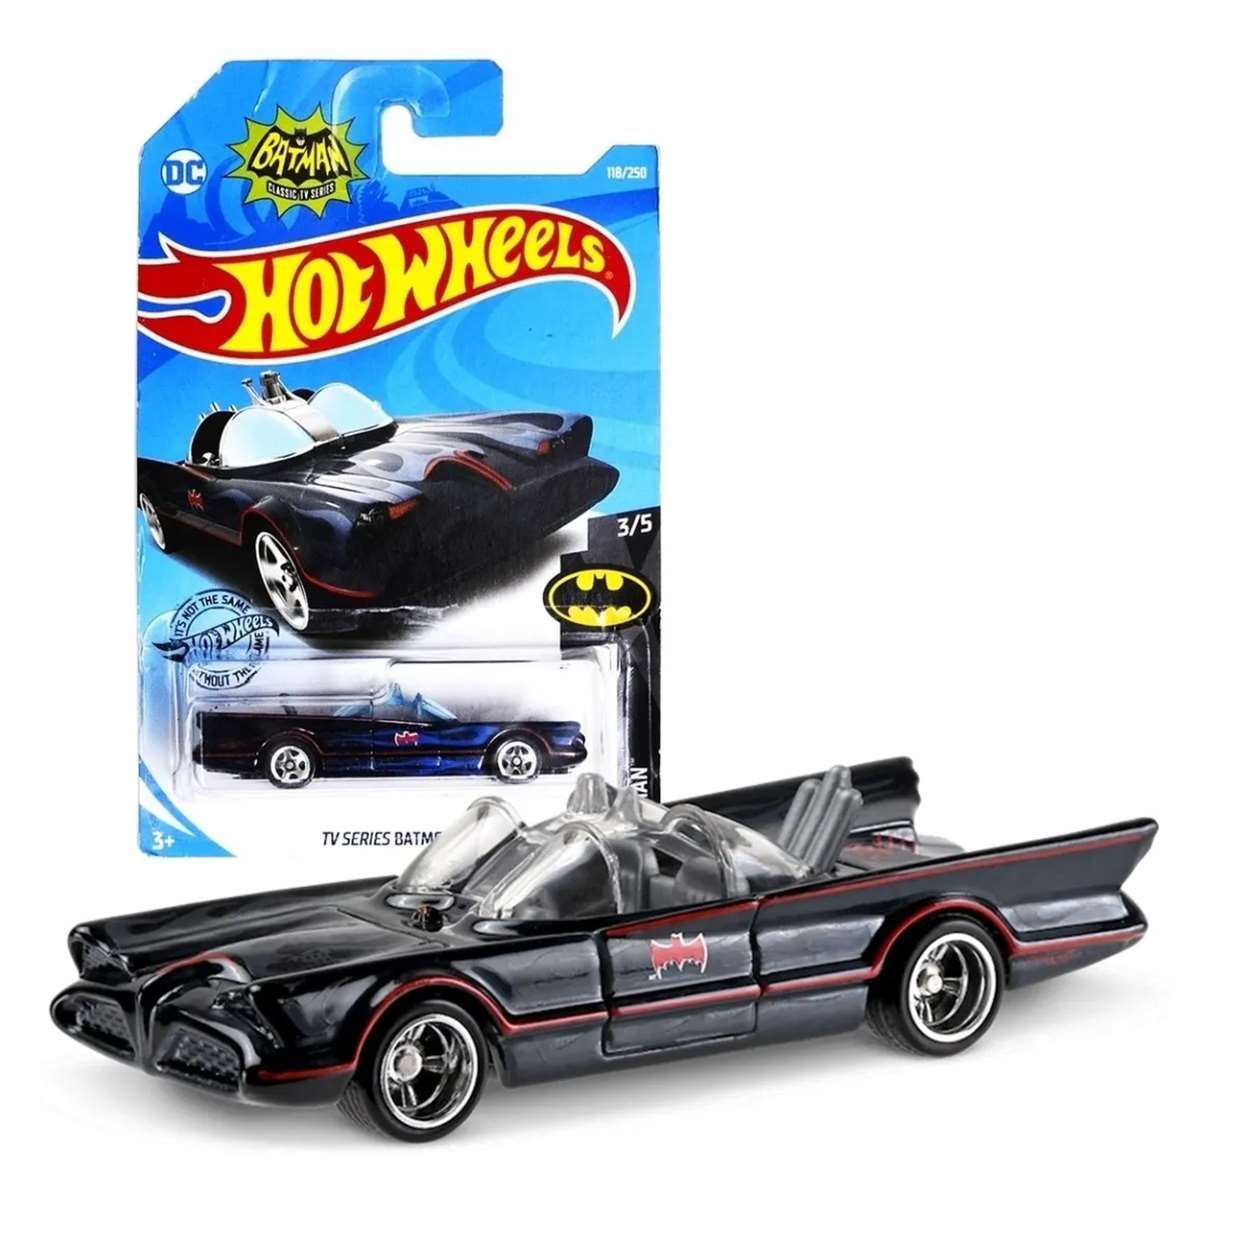 Batmobile 3/5 Batman Tv Series Vehiculo Dc Comics Hot Wheels